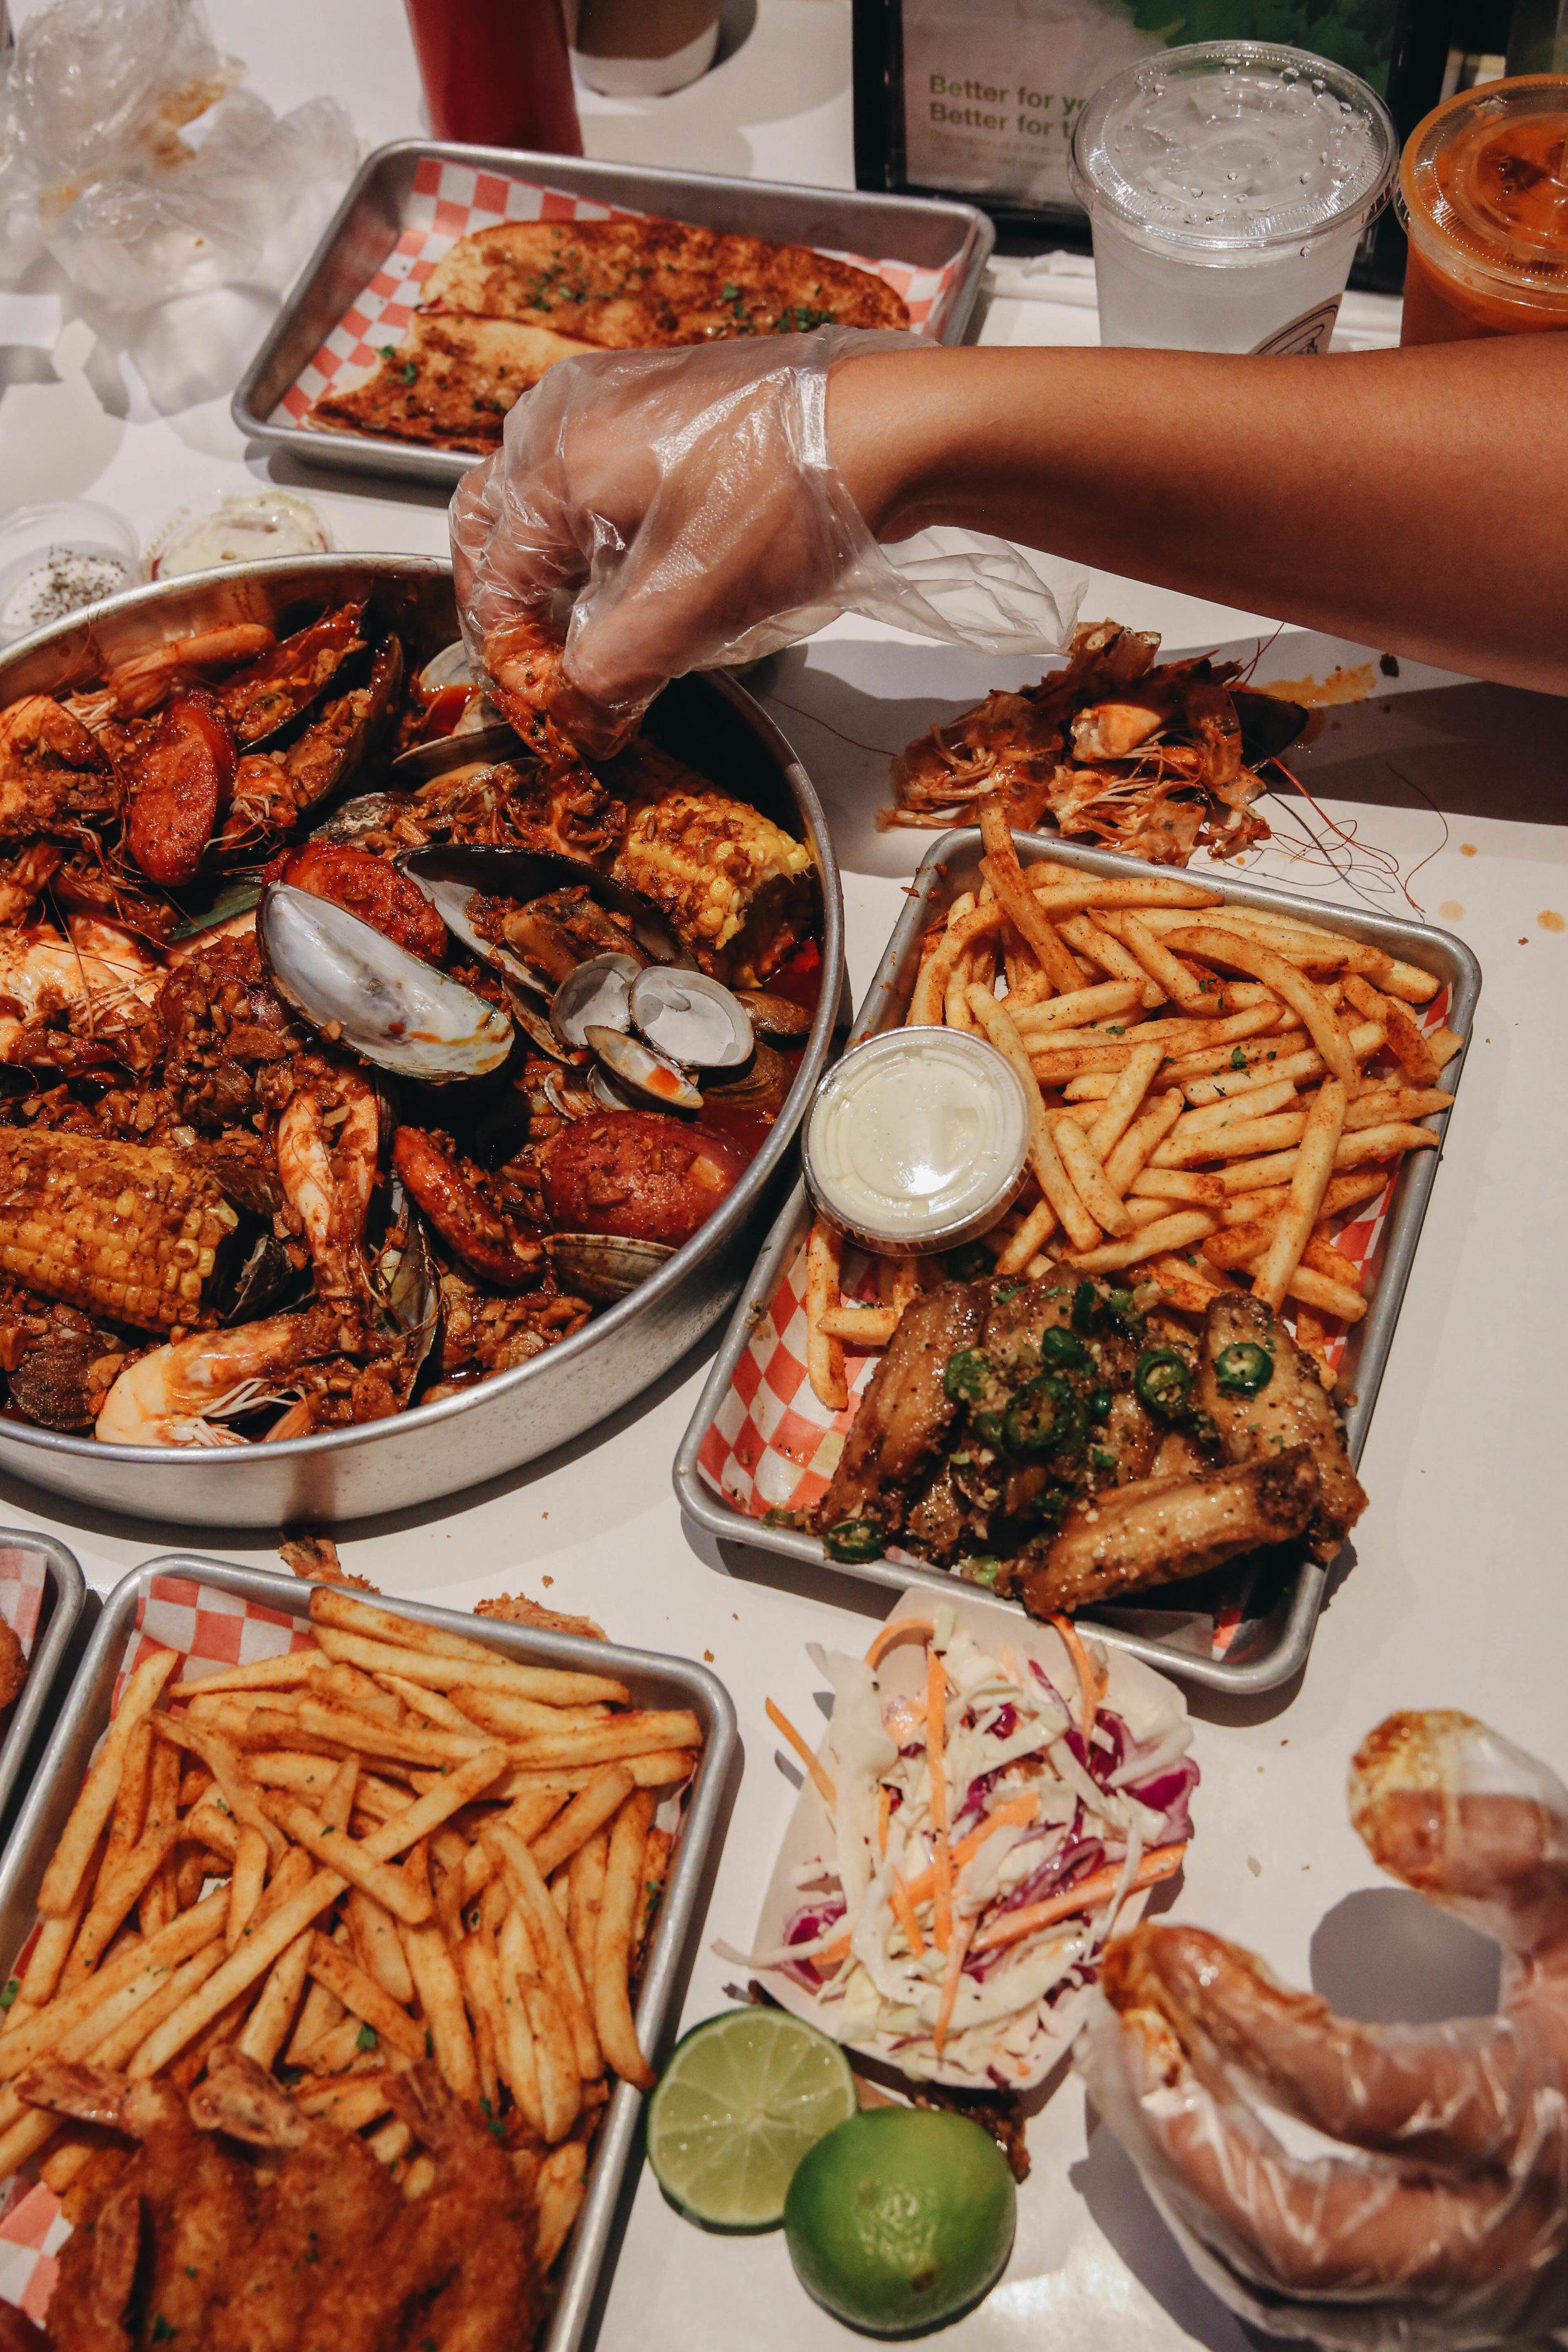 LA-Downtowner-Uncle-Johns-Cafe-4.jpg